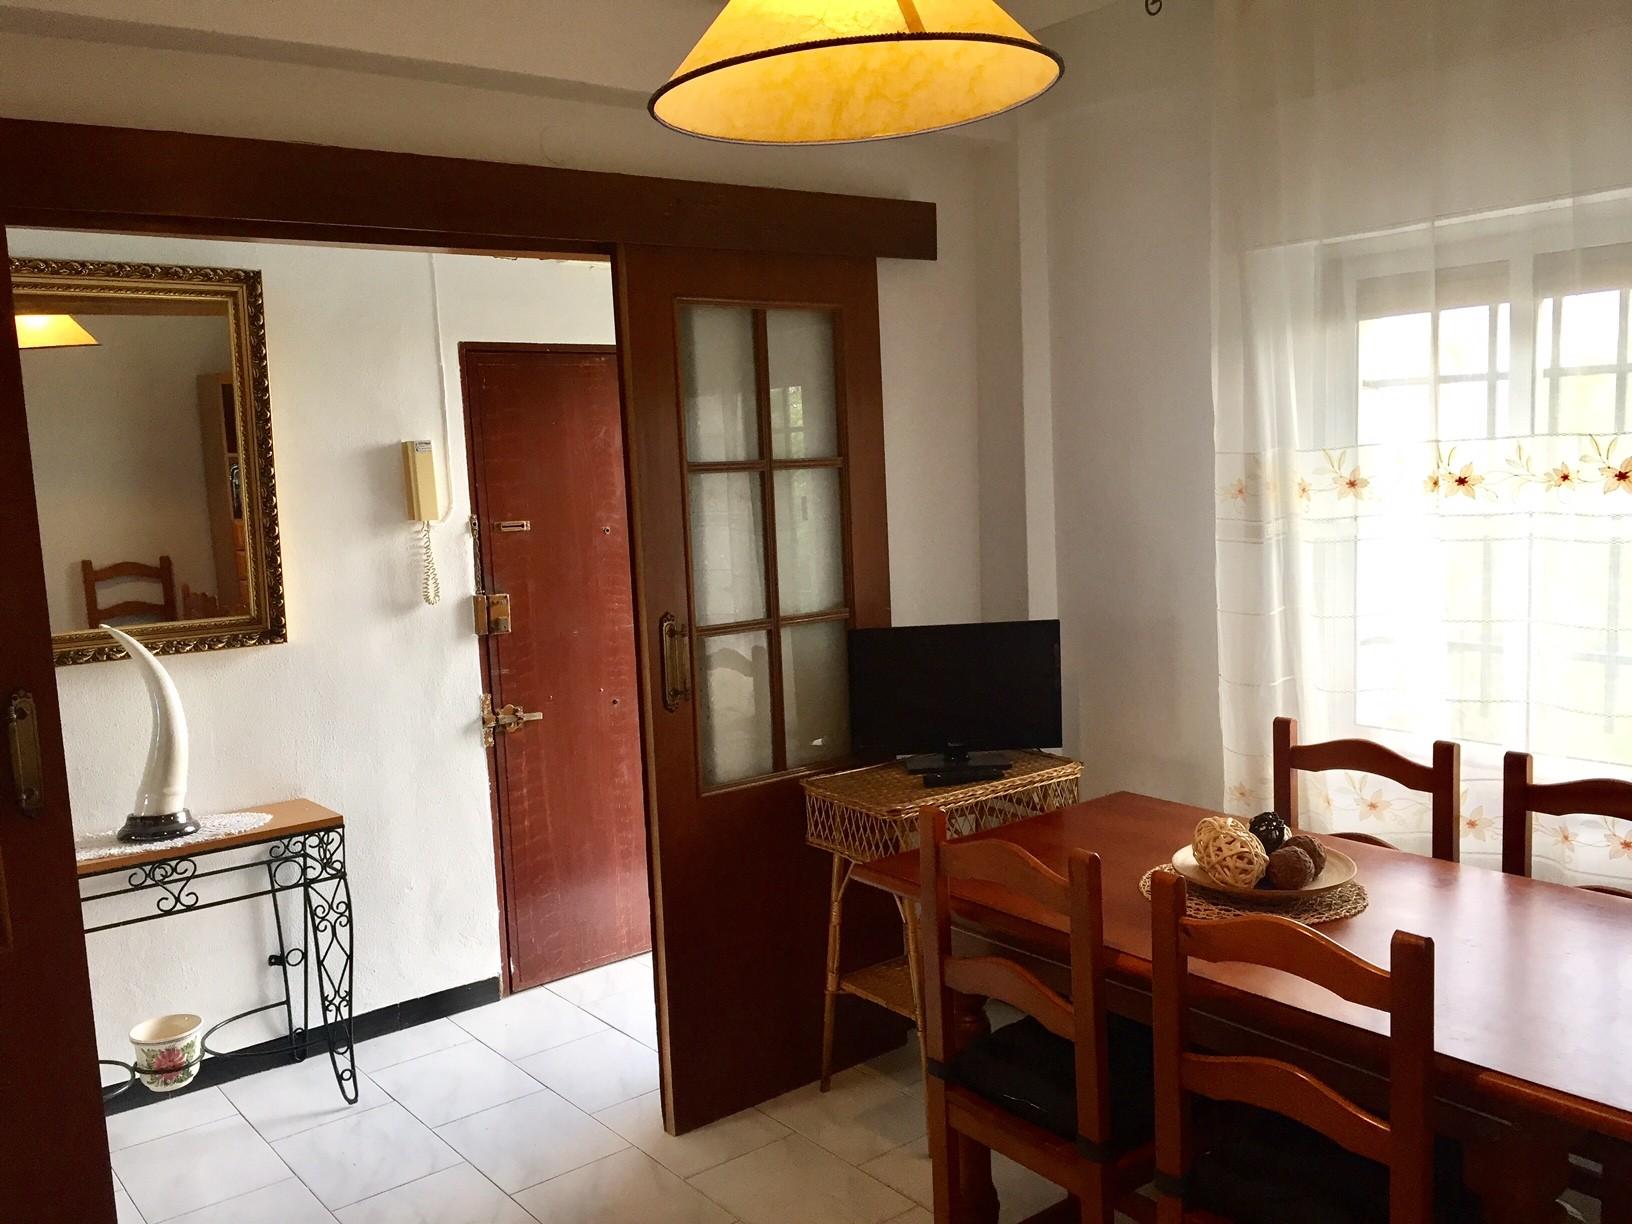 habitacion-en-avenida-ramon-y-cajal-428167f28e25ae4d39f742daa49d7681